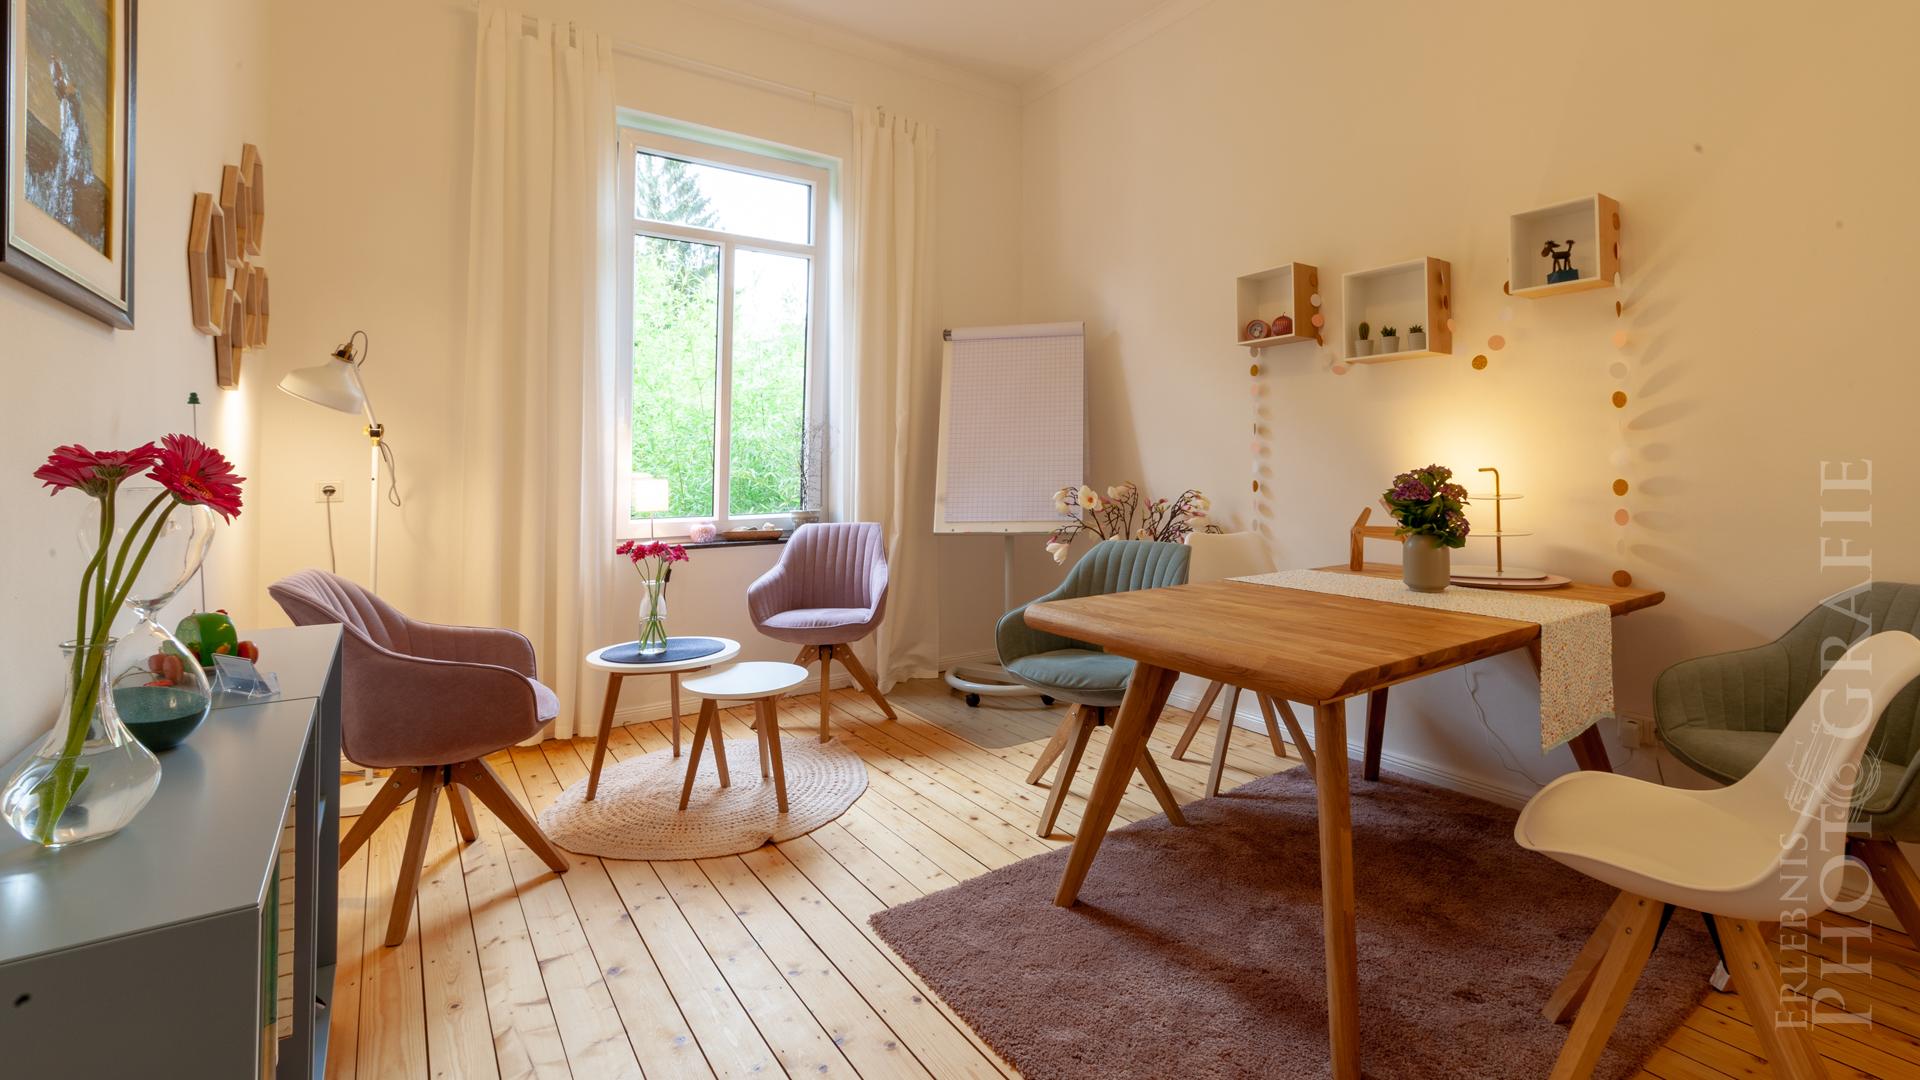 Fotostudio, Fotograf, Bremen, Unternehmen, Werbung, Marketing, Imagebroschüre, indoor, Immobilienfotografie